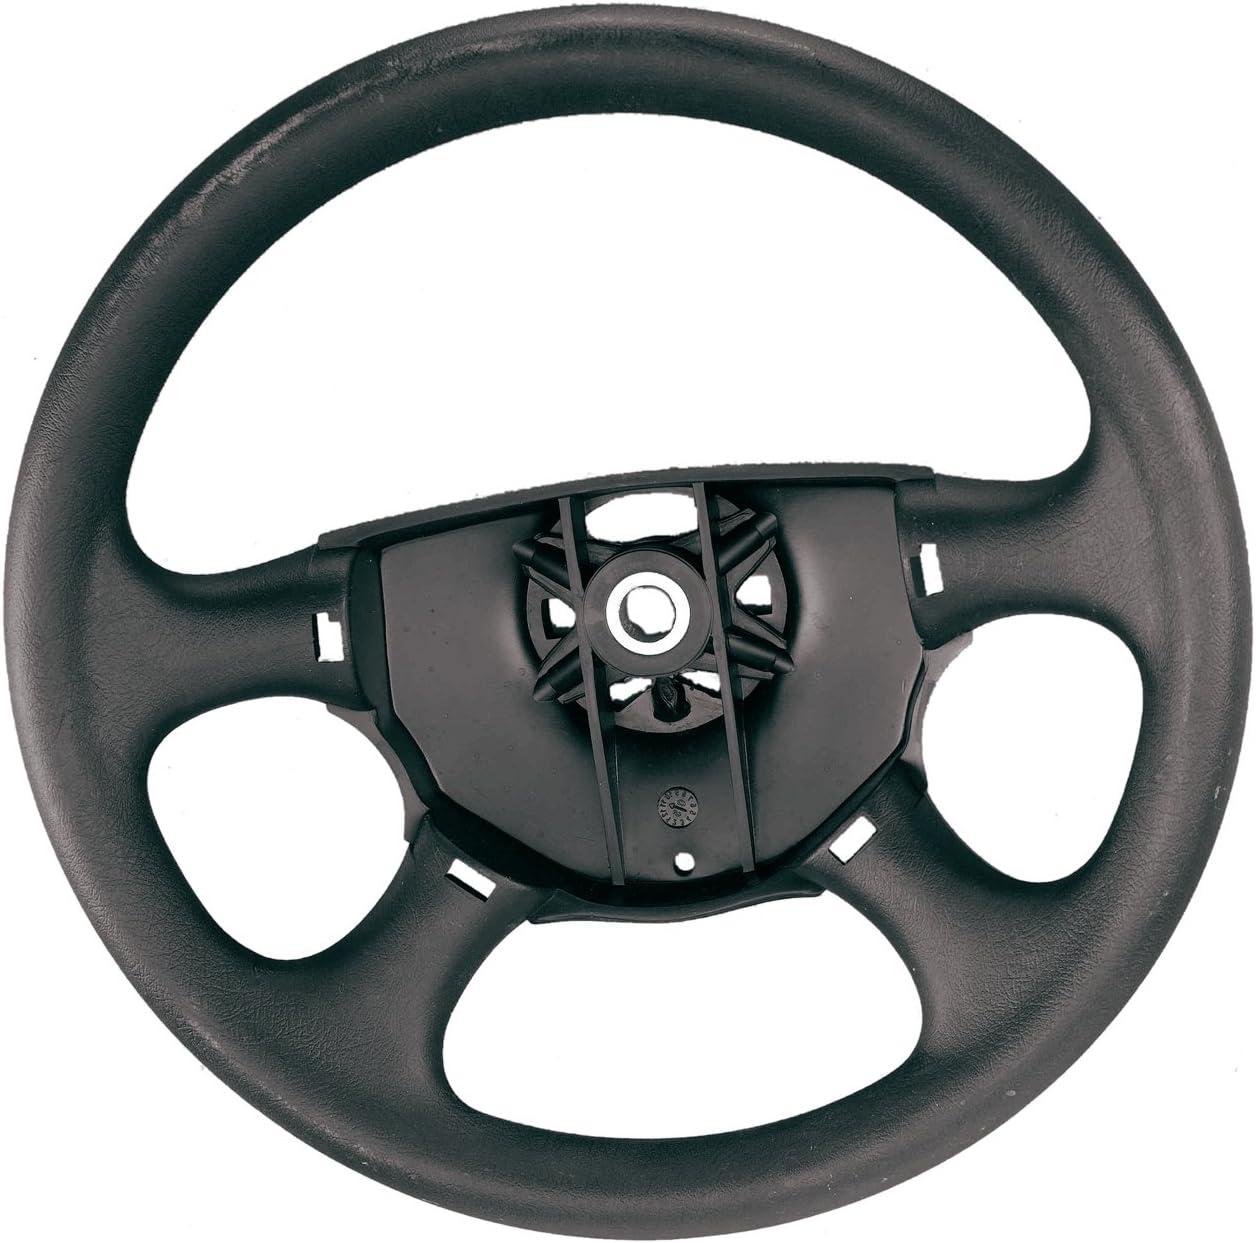 EZGO 71948G01 Steering Wheel